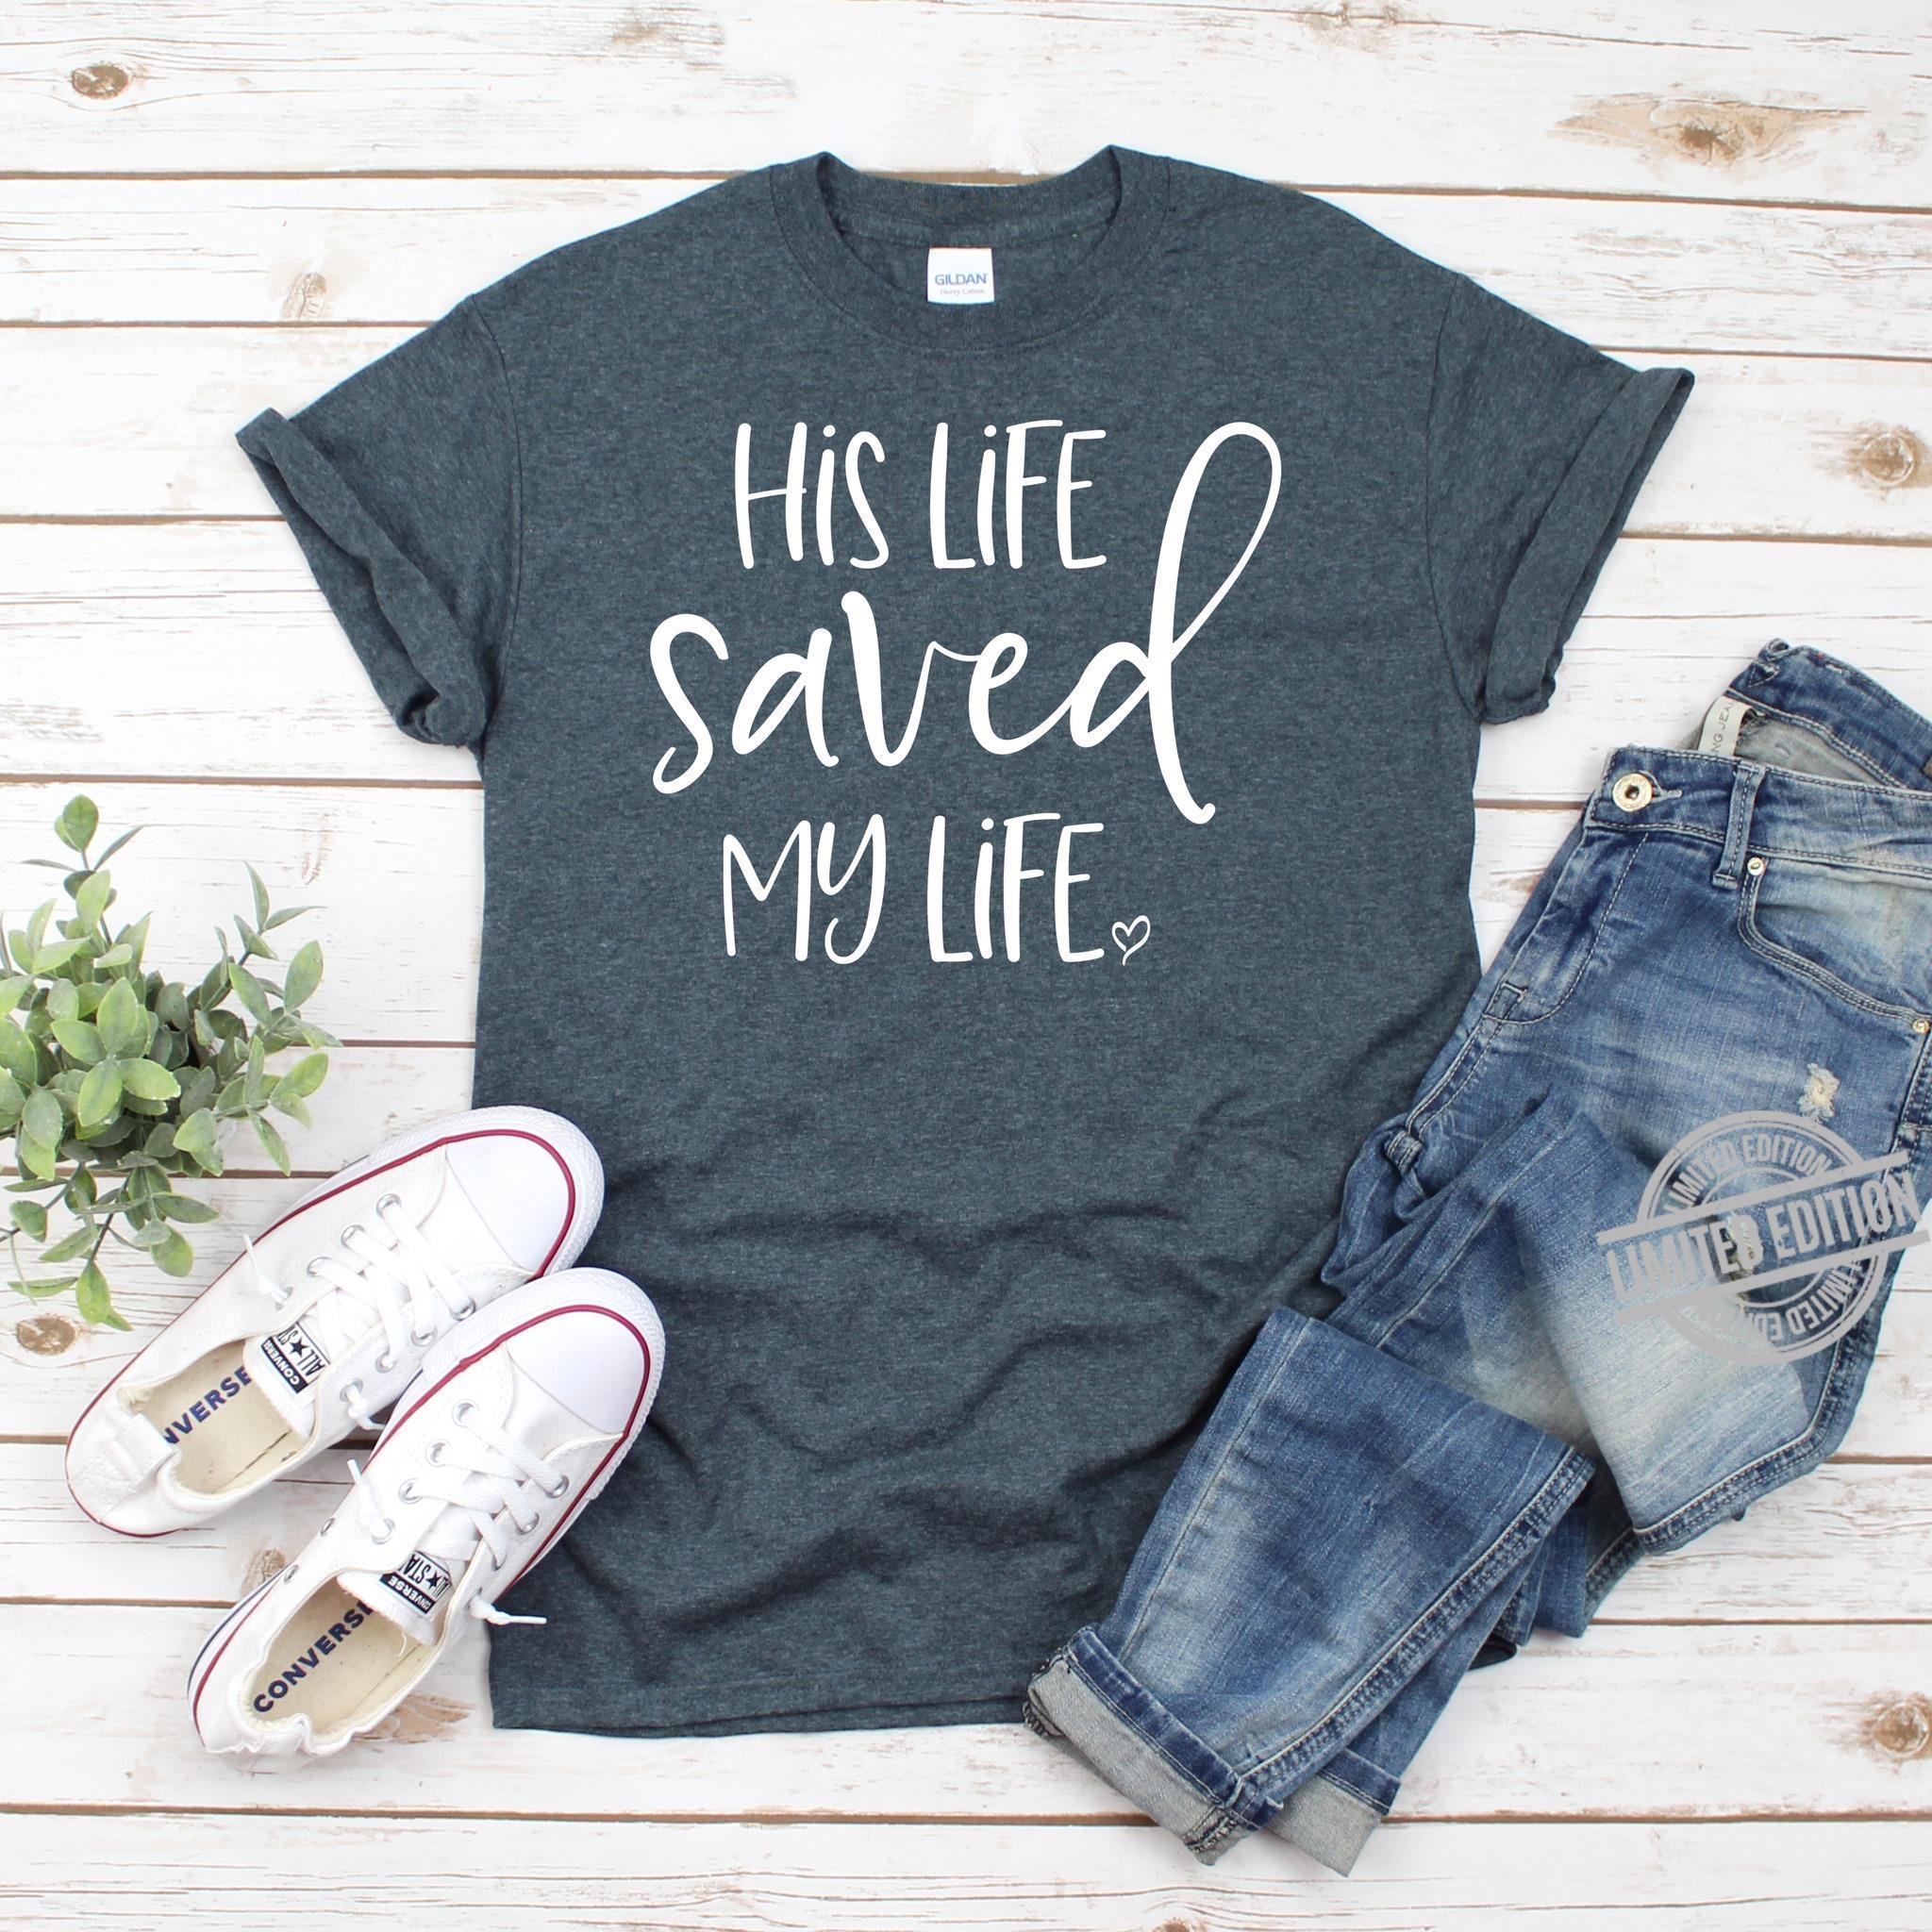 Jis Life Saved My Life Shirt